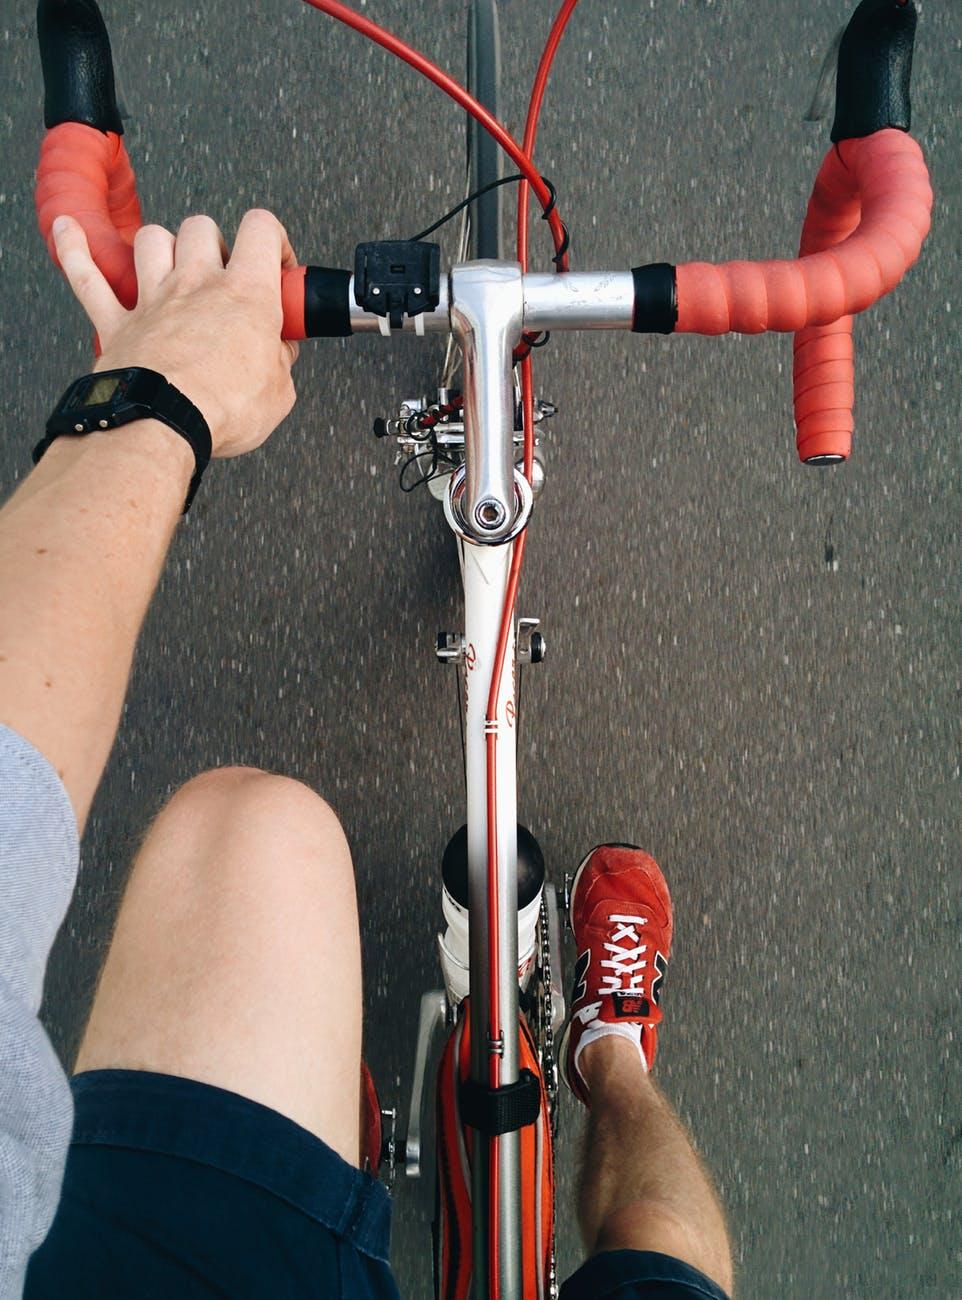 night-sport-bike-bicycle.jpg